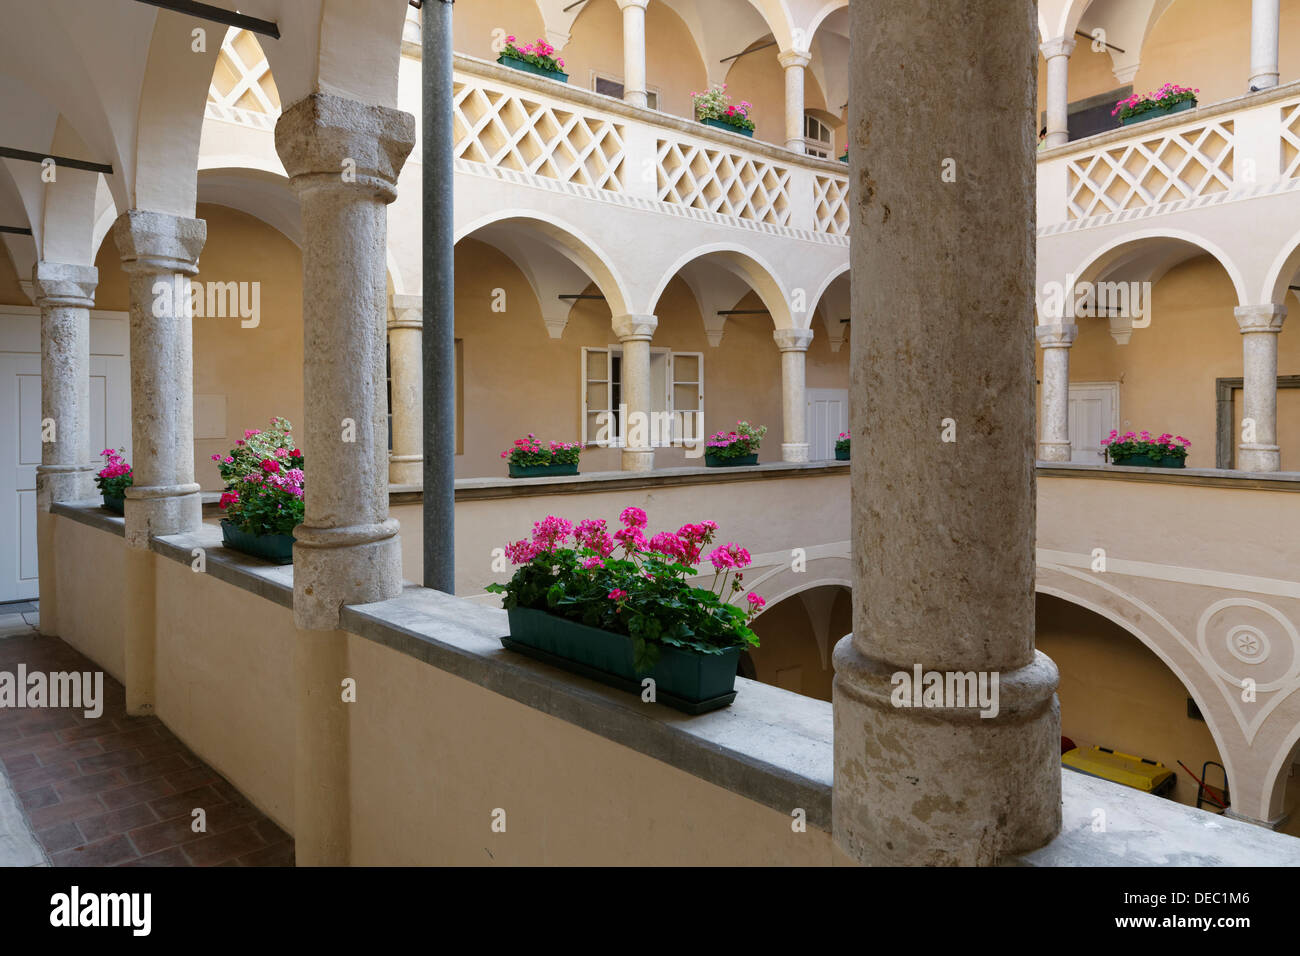 Old Town Hall, arcaded courtyard, historic center, Klagenfurt, Carinthia, Austria - Stock Image